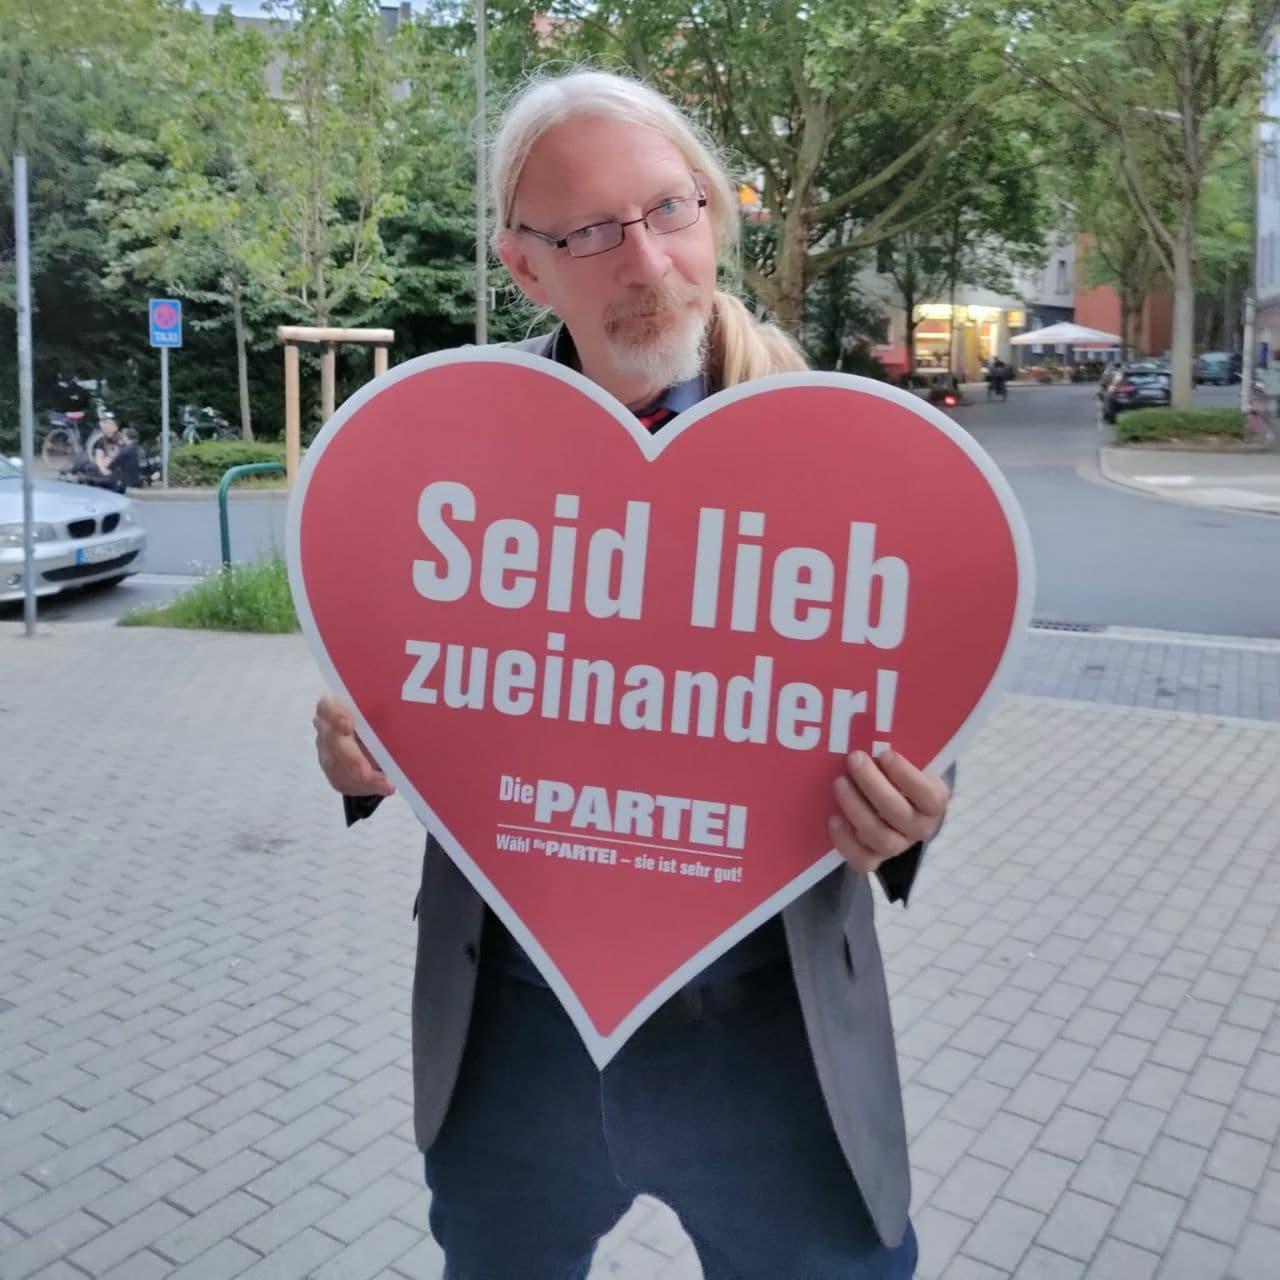 Der Kreisverband Dortmund trauert um Raimund Storb